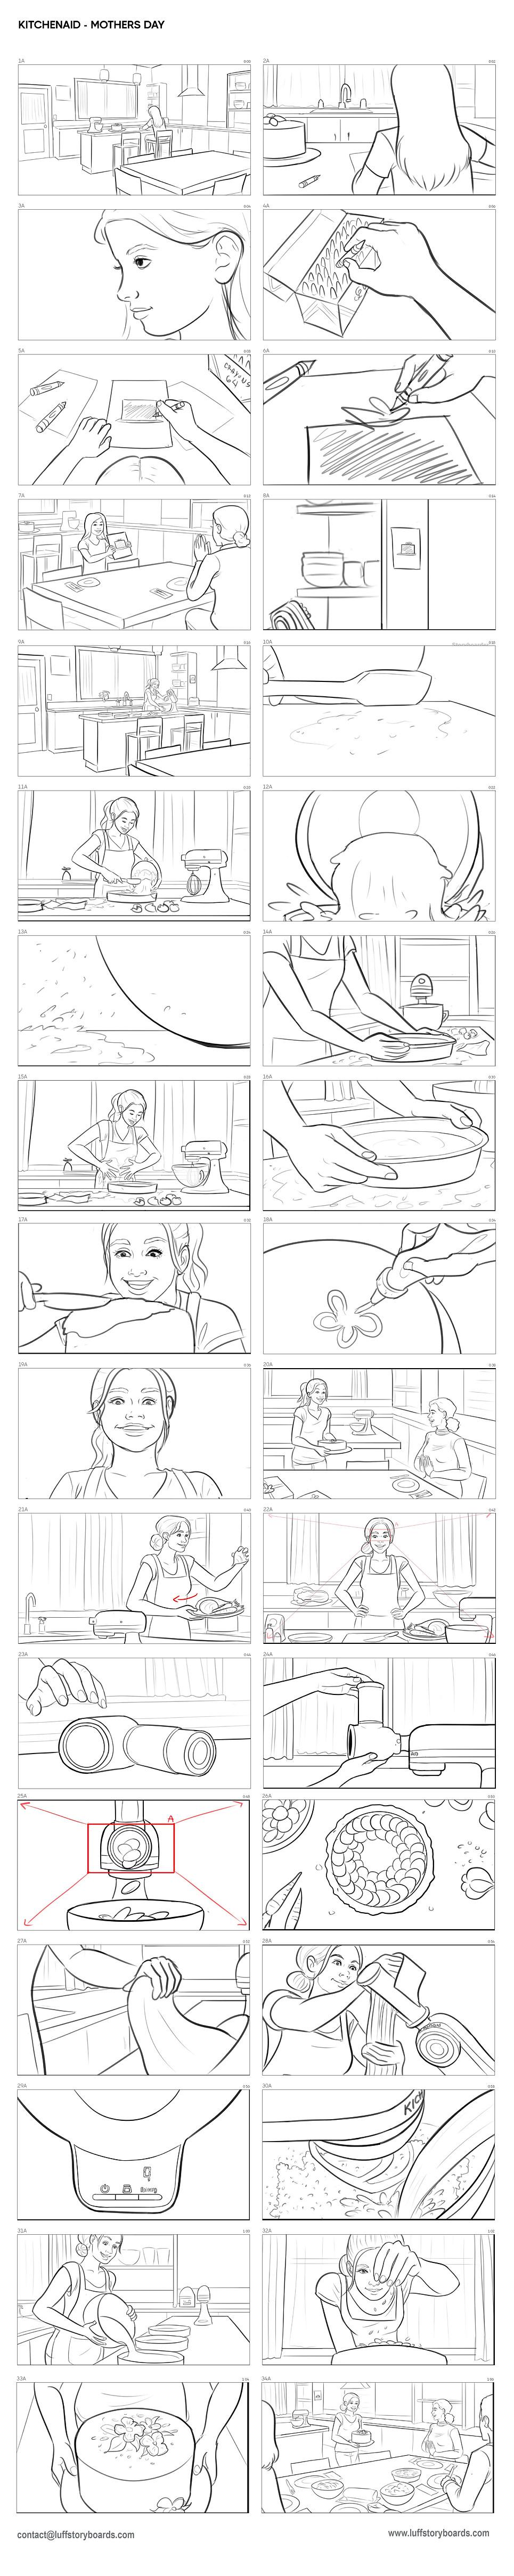 KitchenAid - Mothers Day_LuffStoryboards